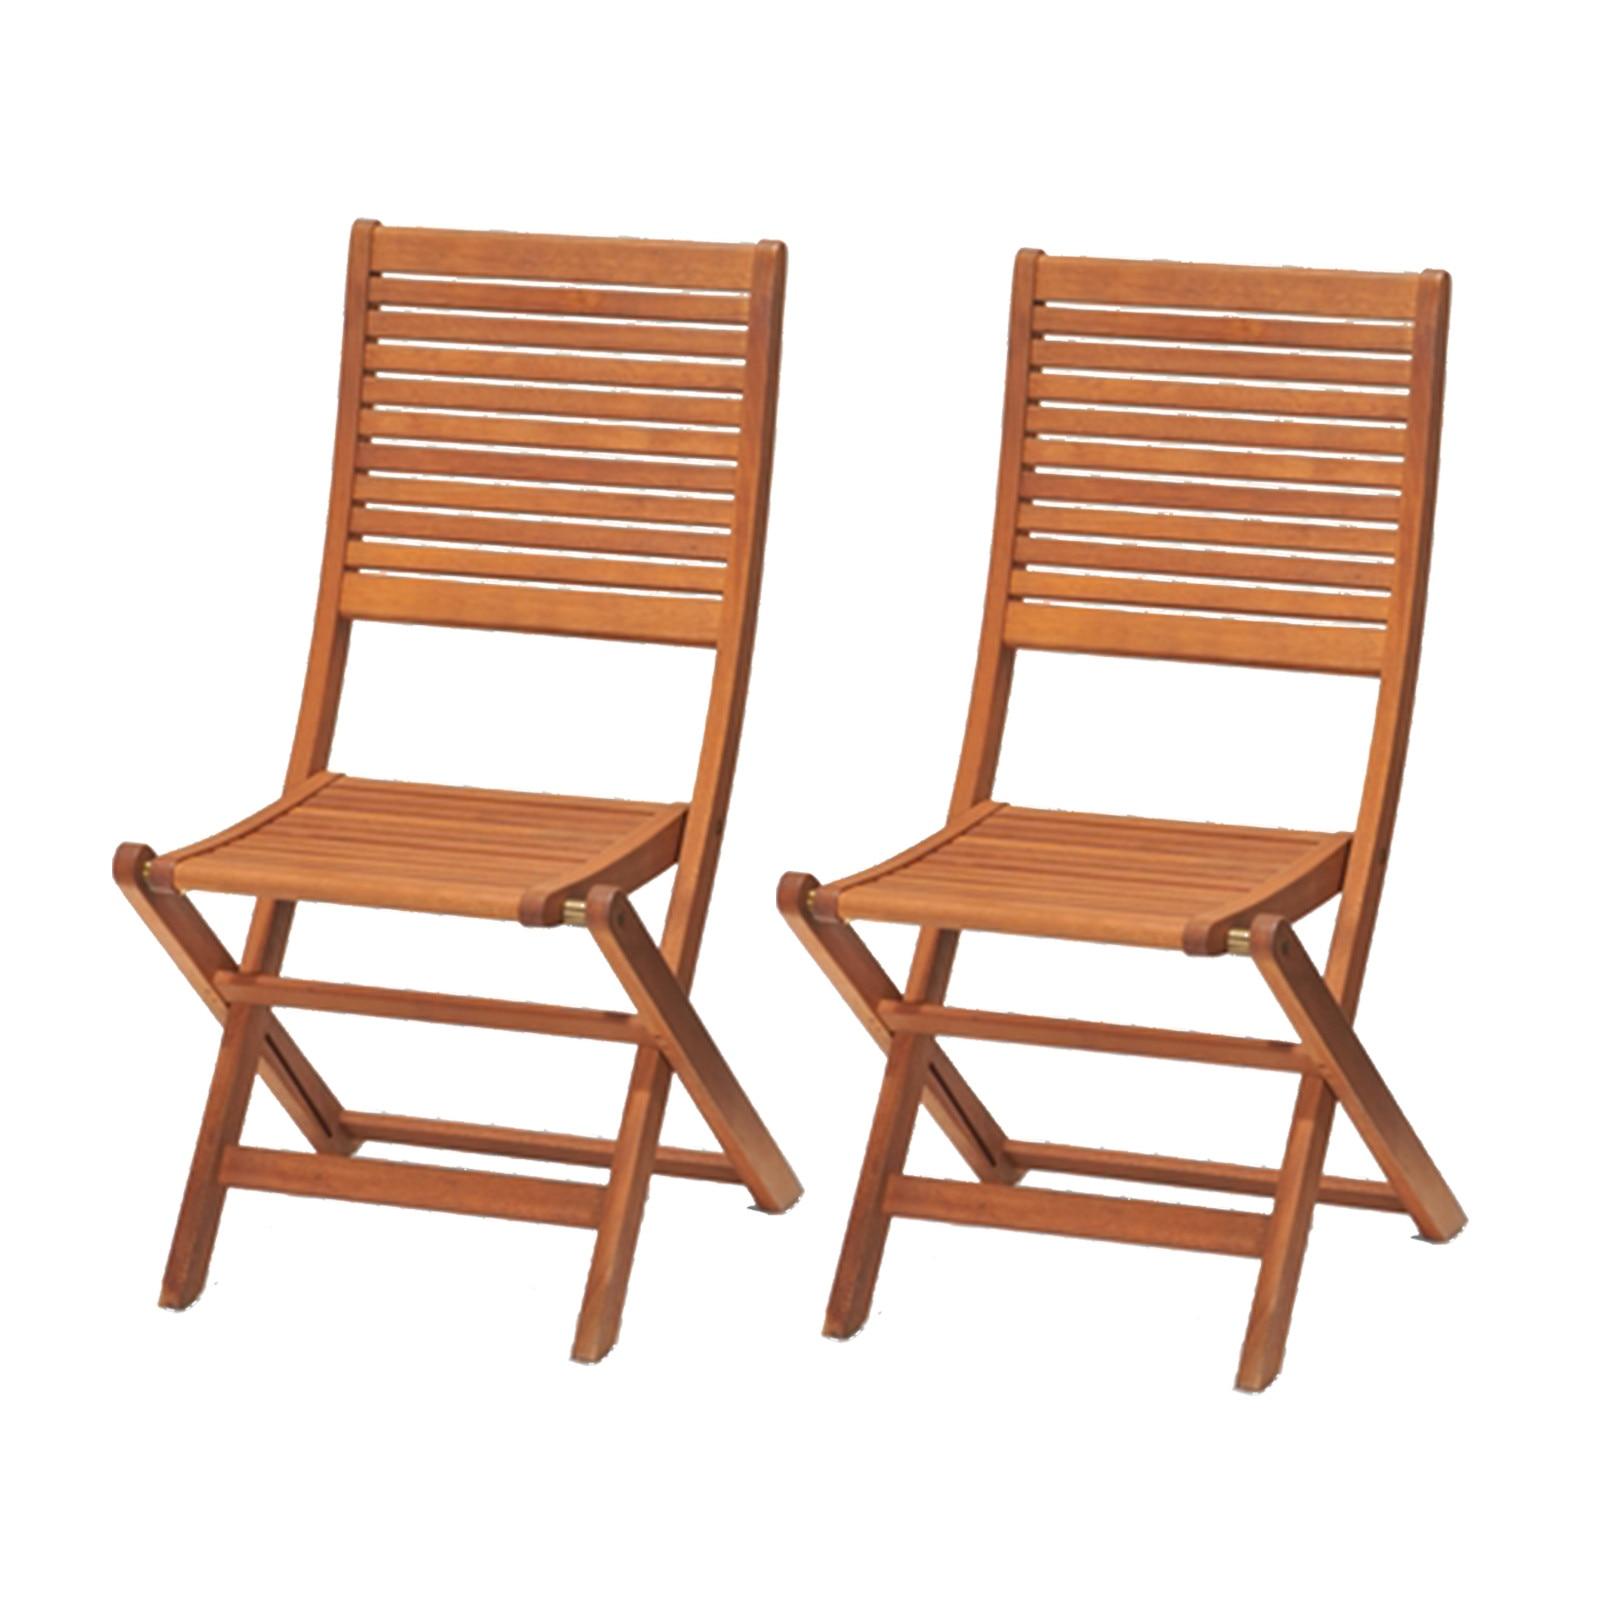 Kingsbury-2 Folding Chairs Wood Eucalyptus 57.86 Cm X 49 Cm.60 X 93.55-4999100100280L